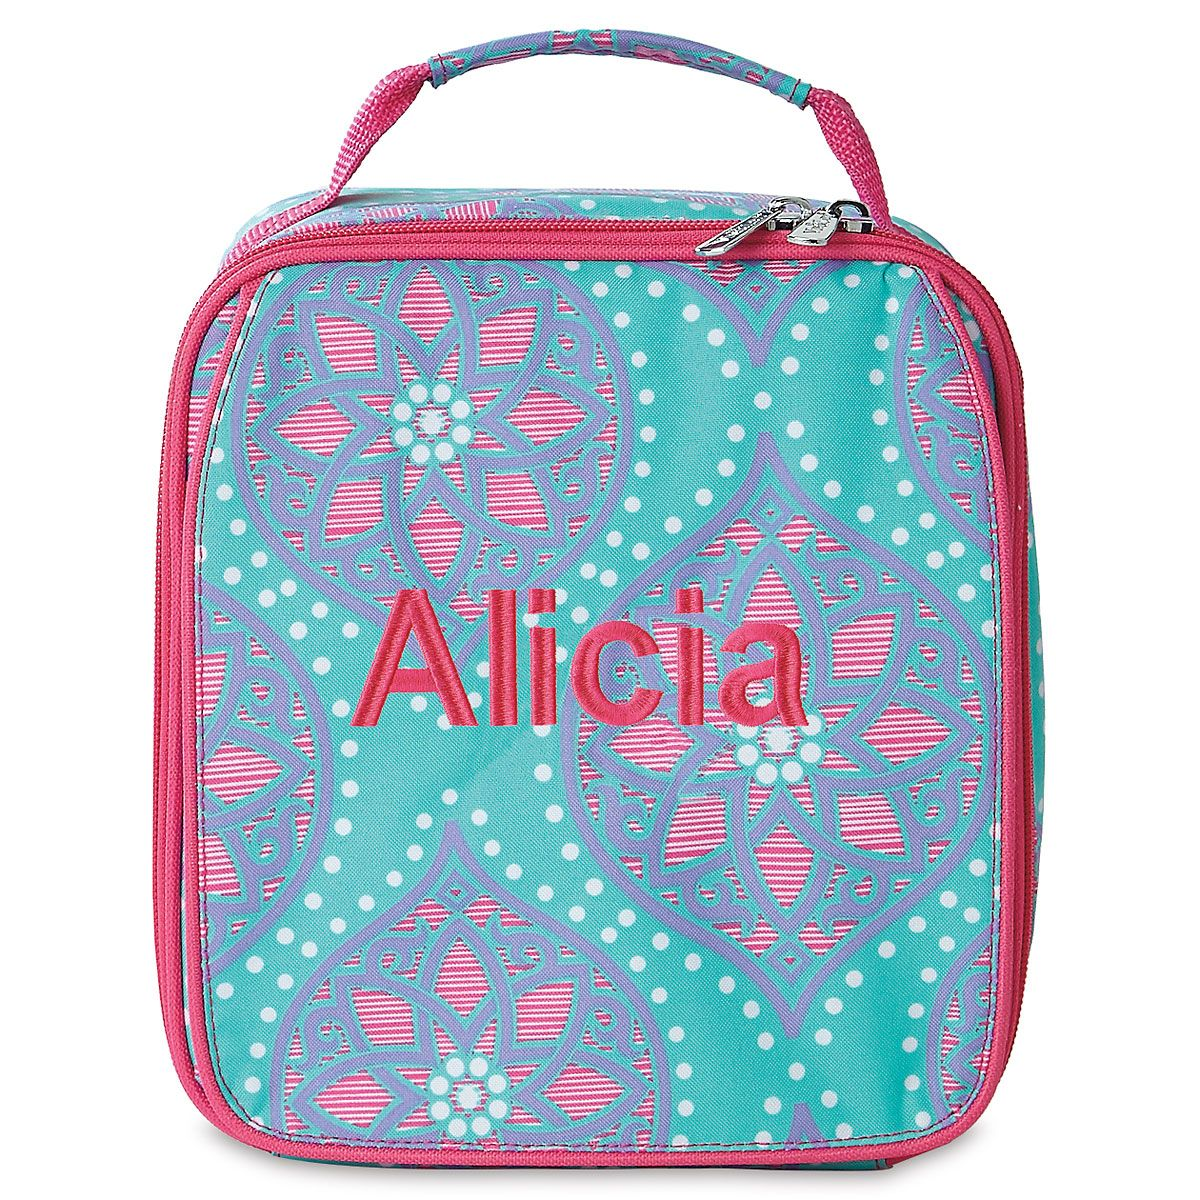 Marlee Lunch Bag - Name